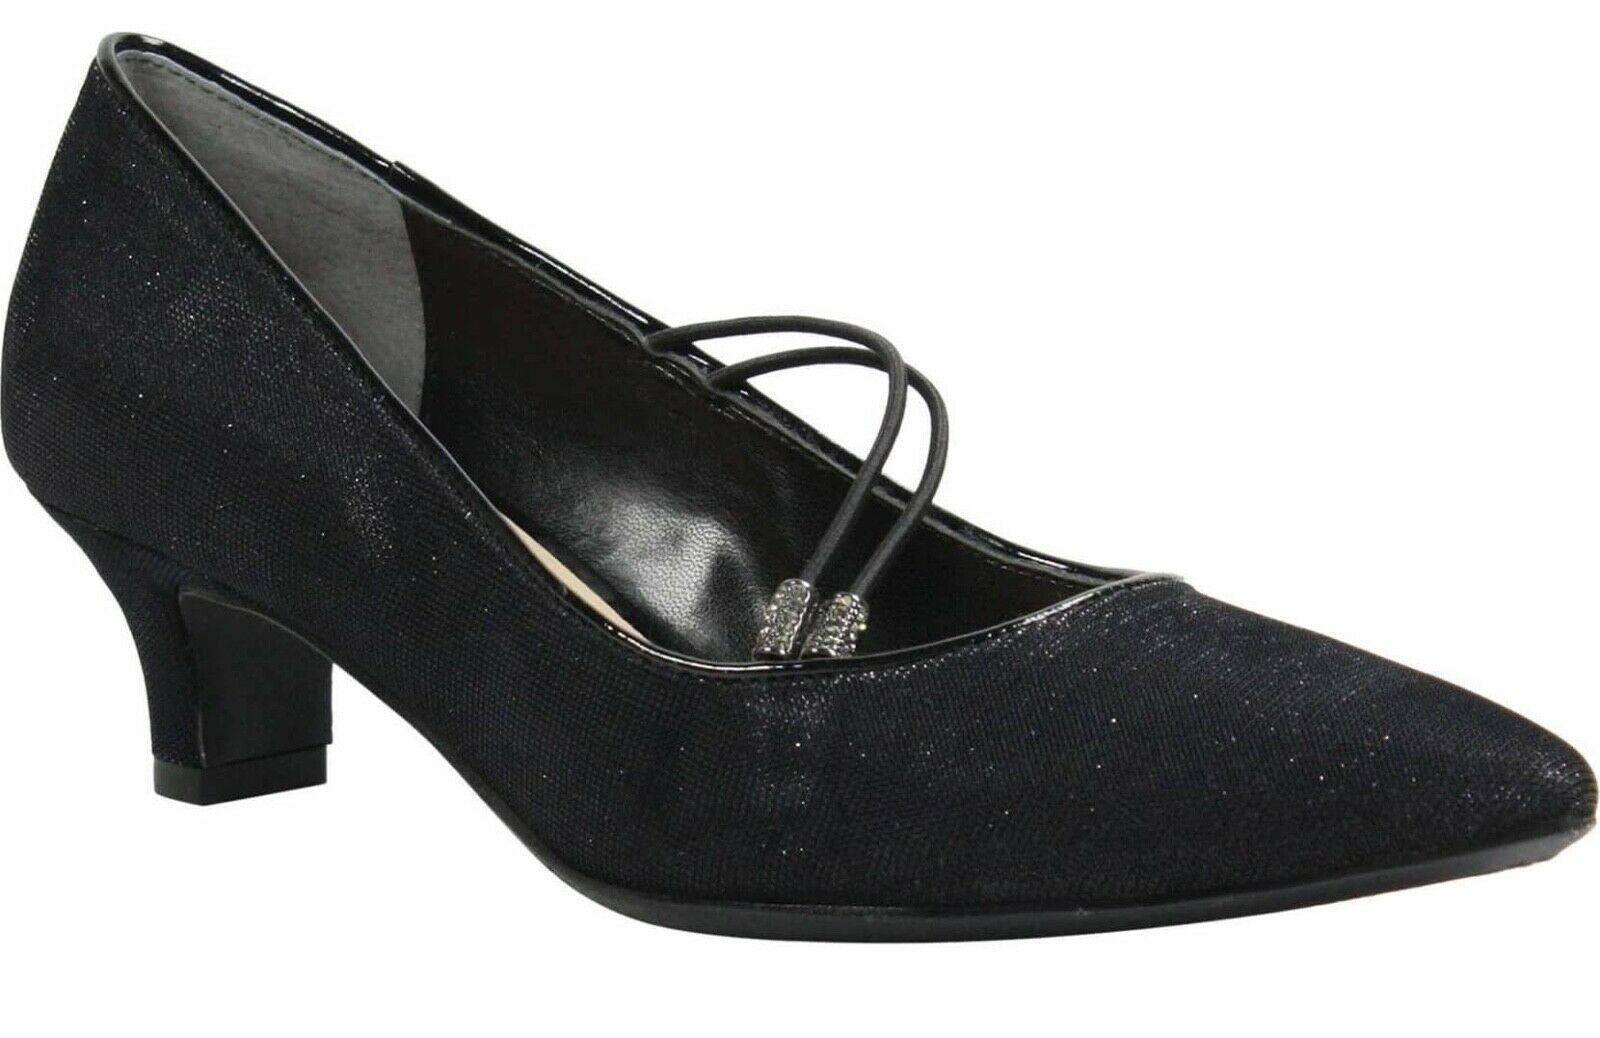 Womens J. Renee Idenah Pumps - Fabric Glitter Black Size 10 - $69.99